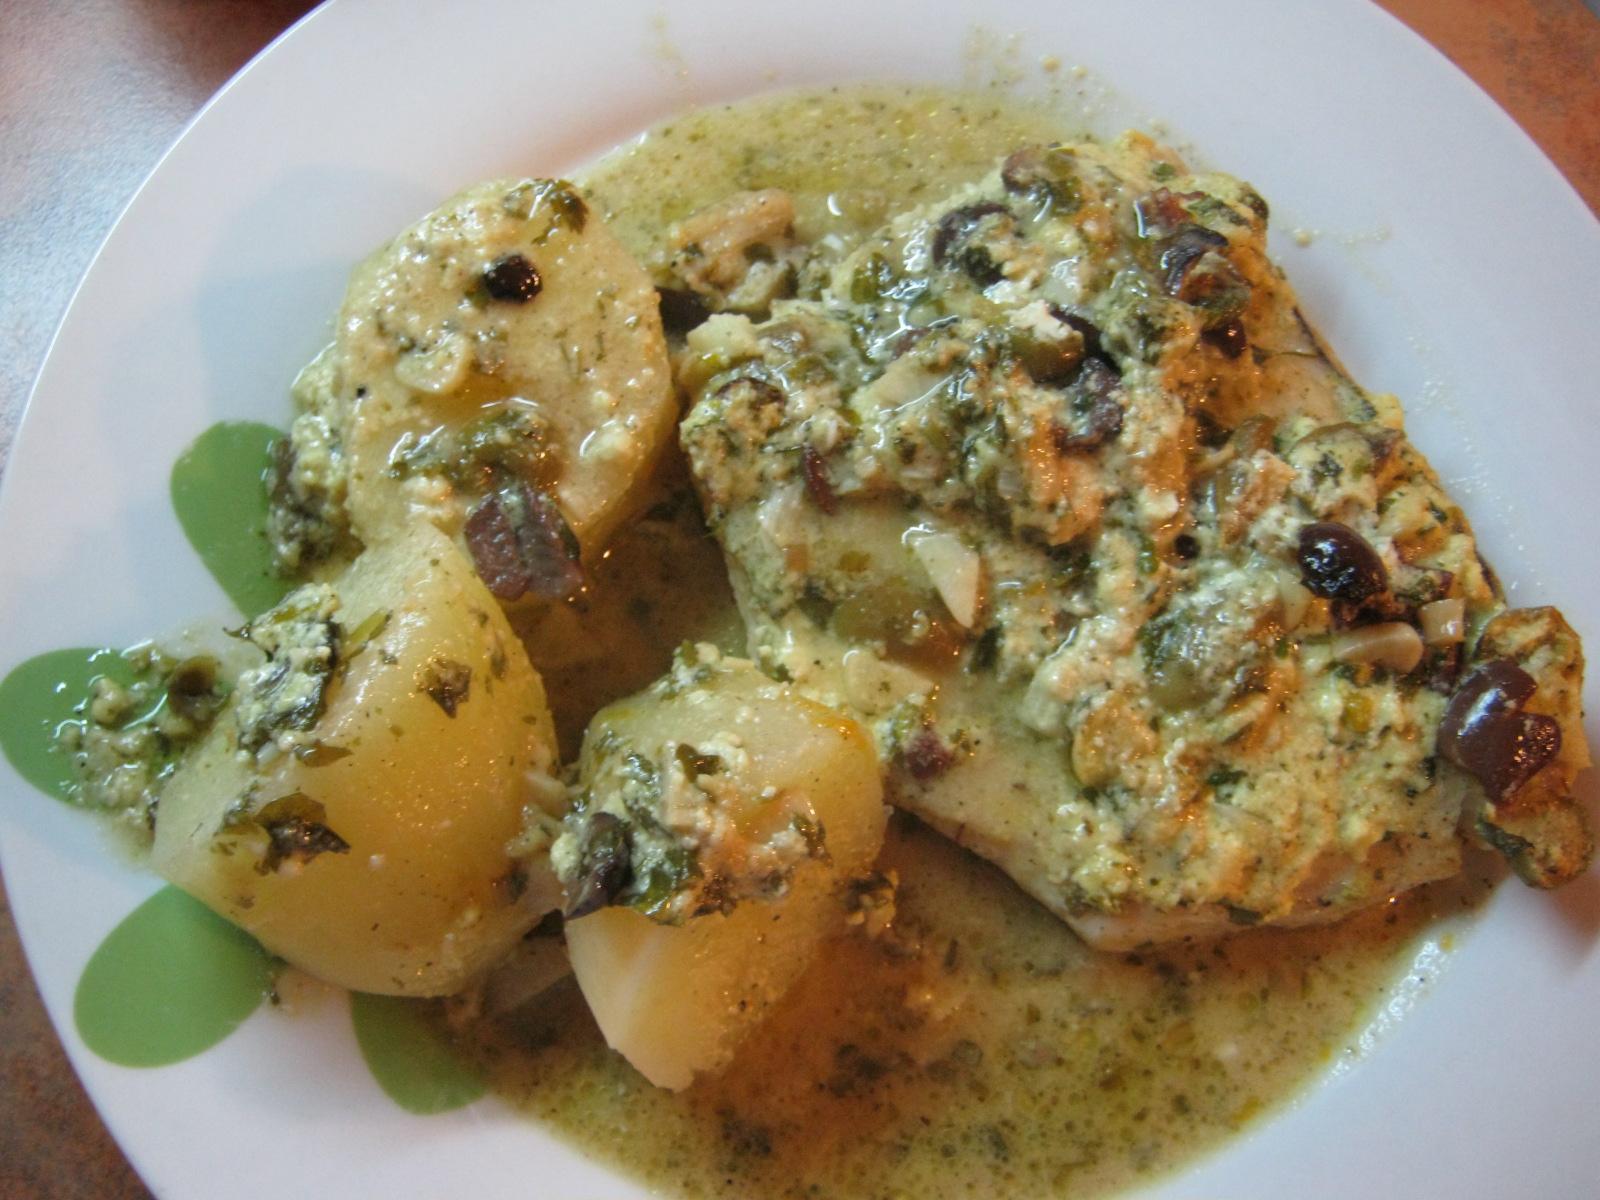 La negra cocina pescado al horno con salsa de queso light - Cocina al horno ...